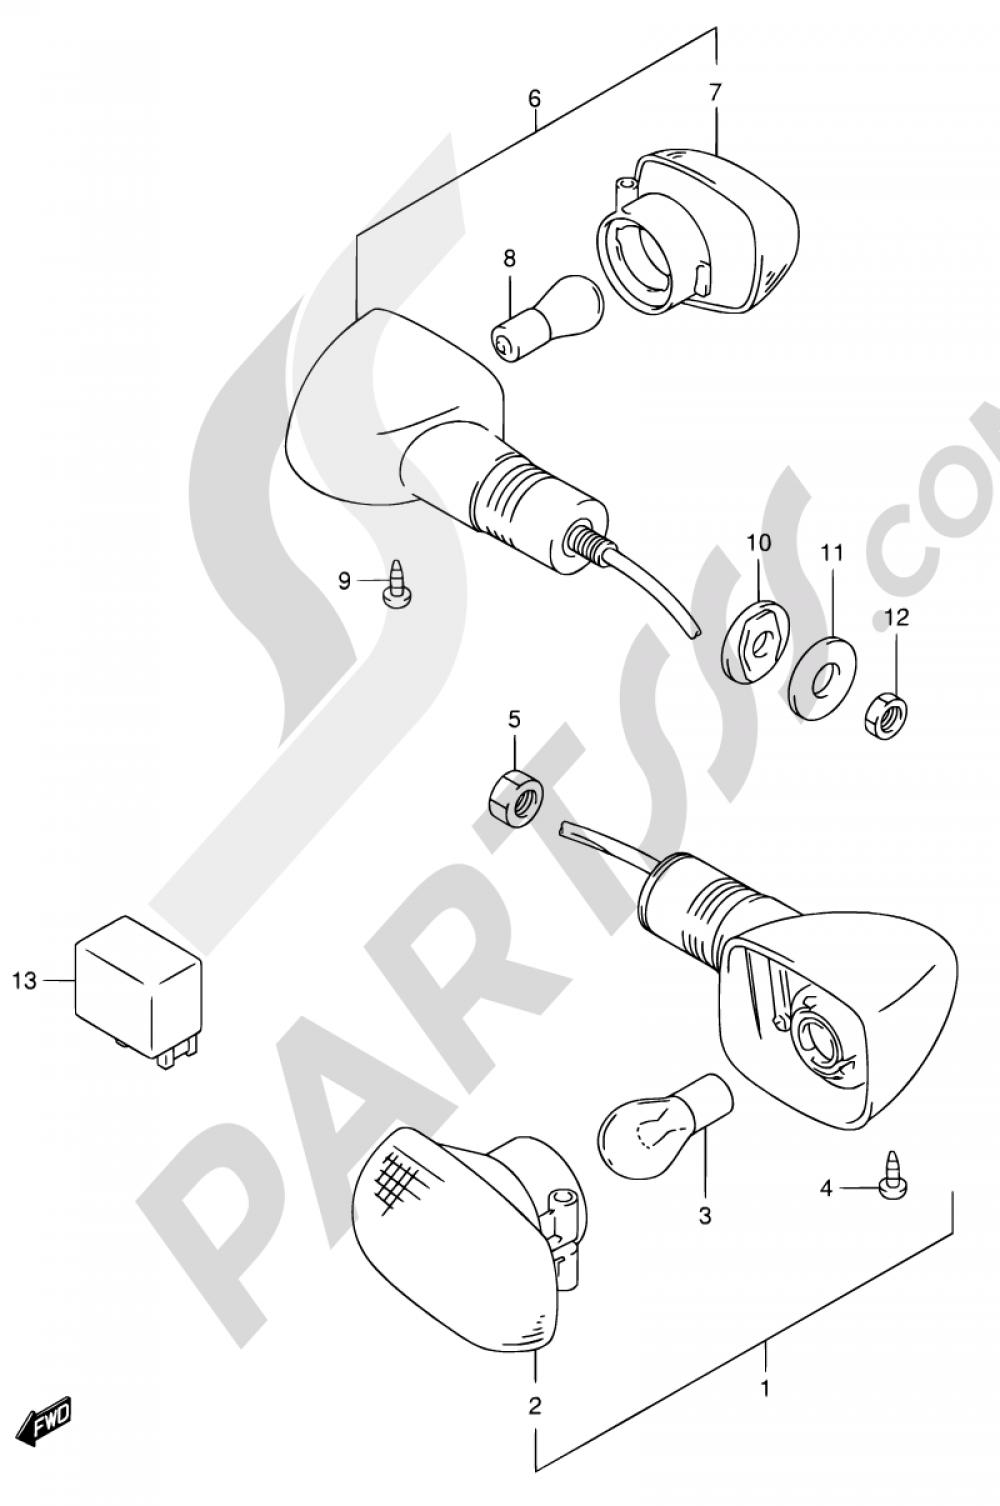 27 - TURNSIGNAL LAMP (SV650X/UX/Y/UY/K1/UK1/K2/UK2) Suzuki SV650 2002